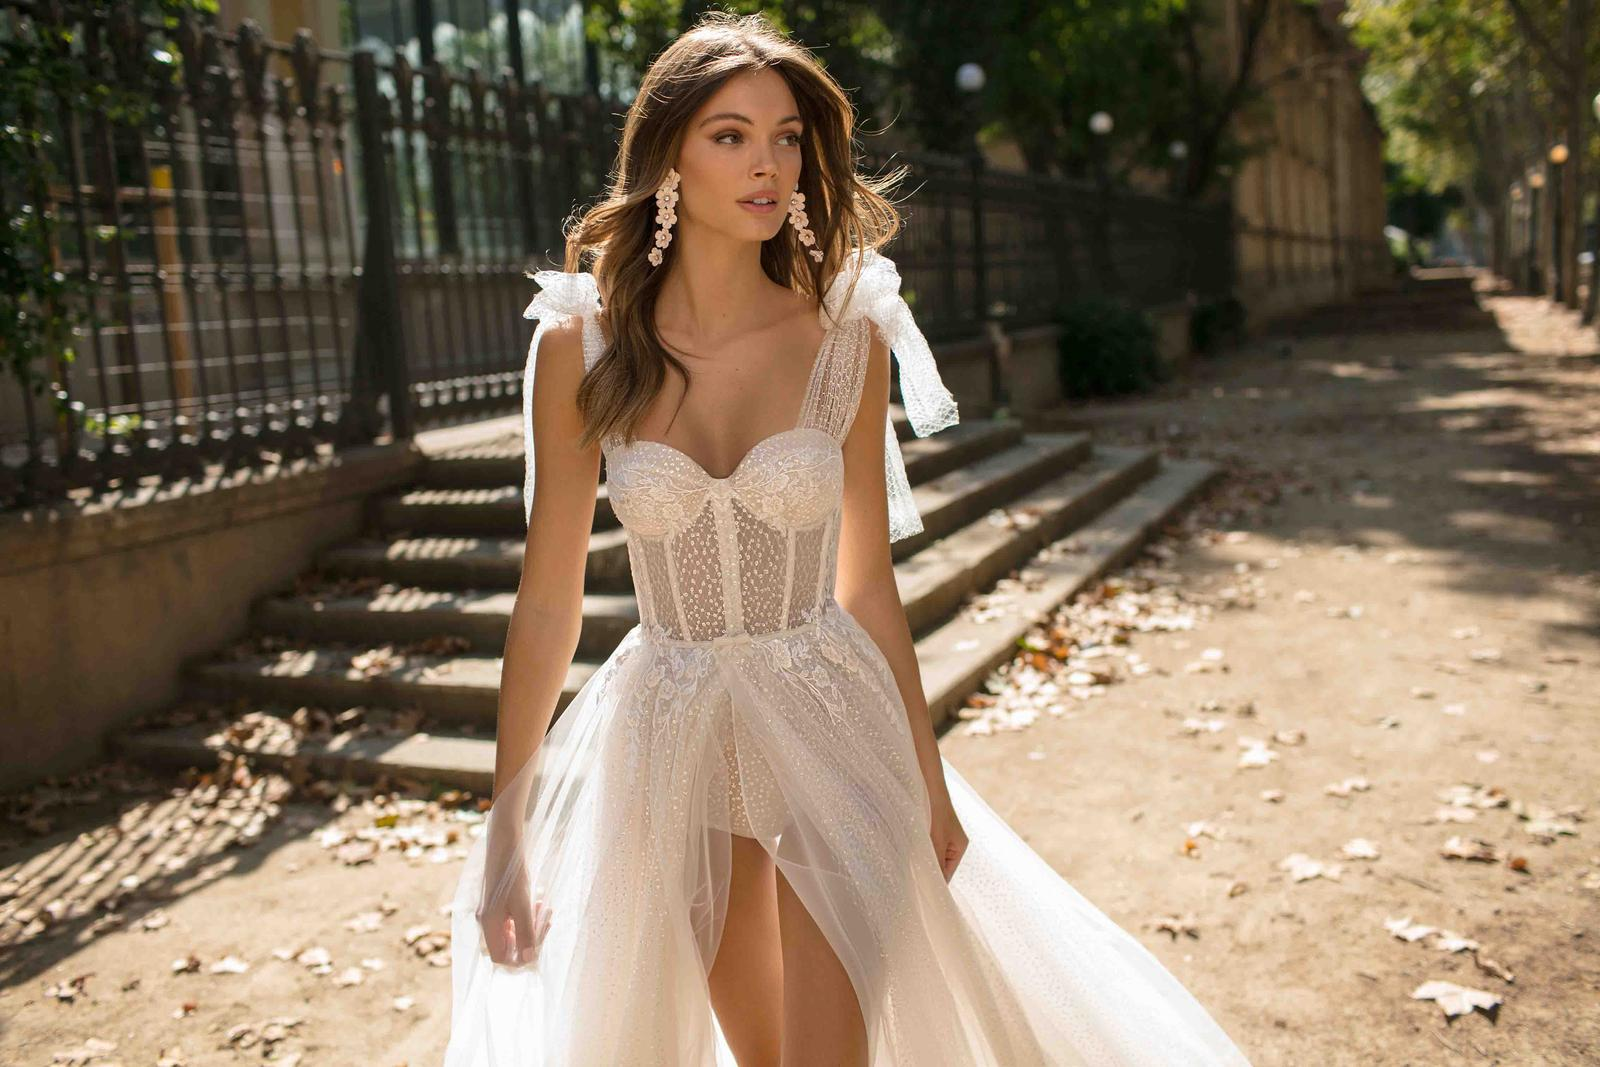 Muse by Berta * Svadobné šaty z kolekcií na rok 2019 - Obrázok č. 29